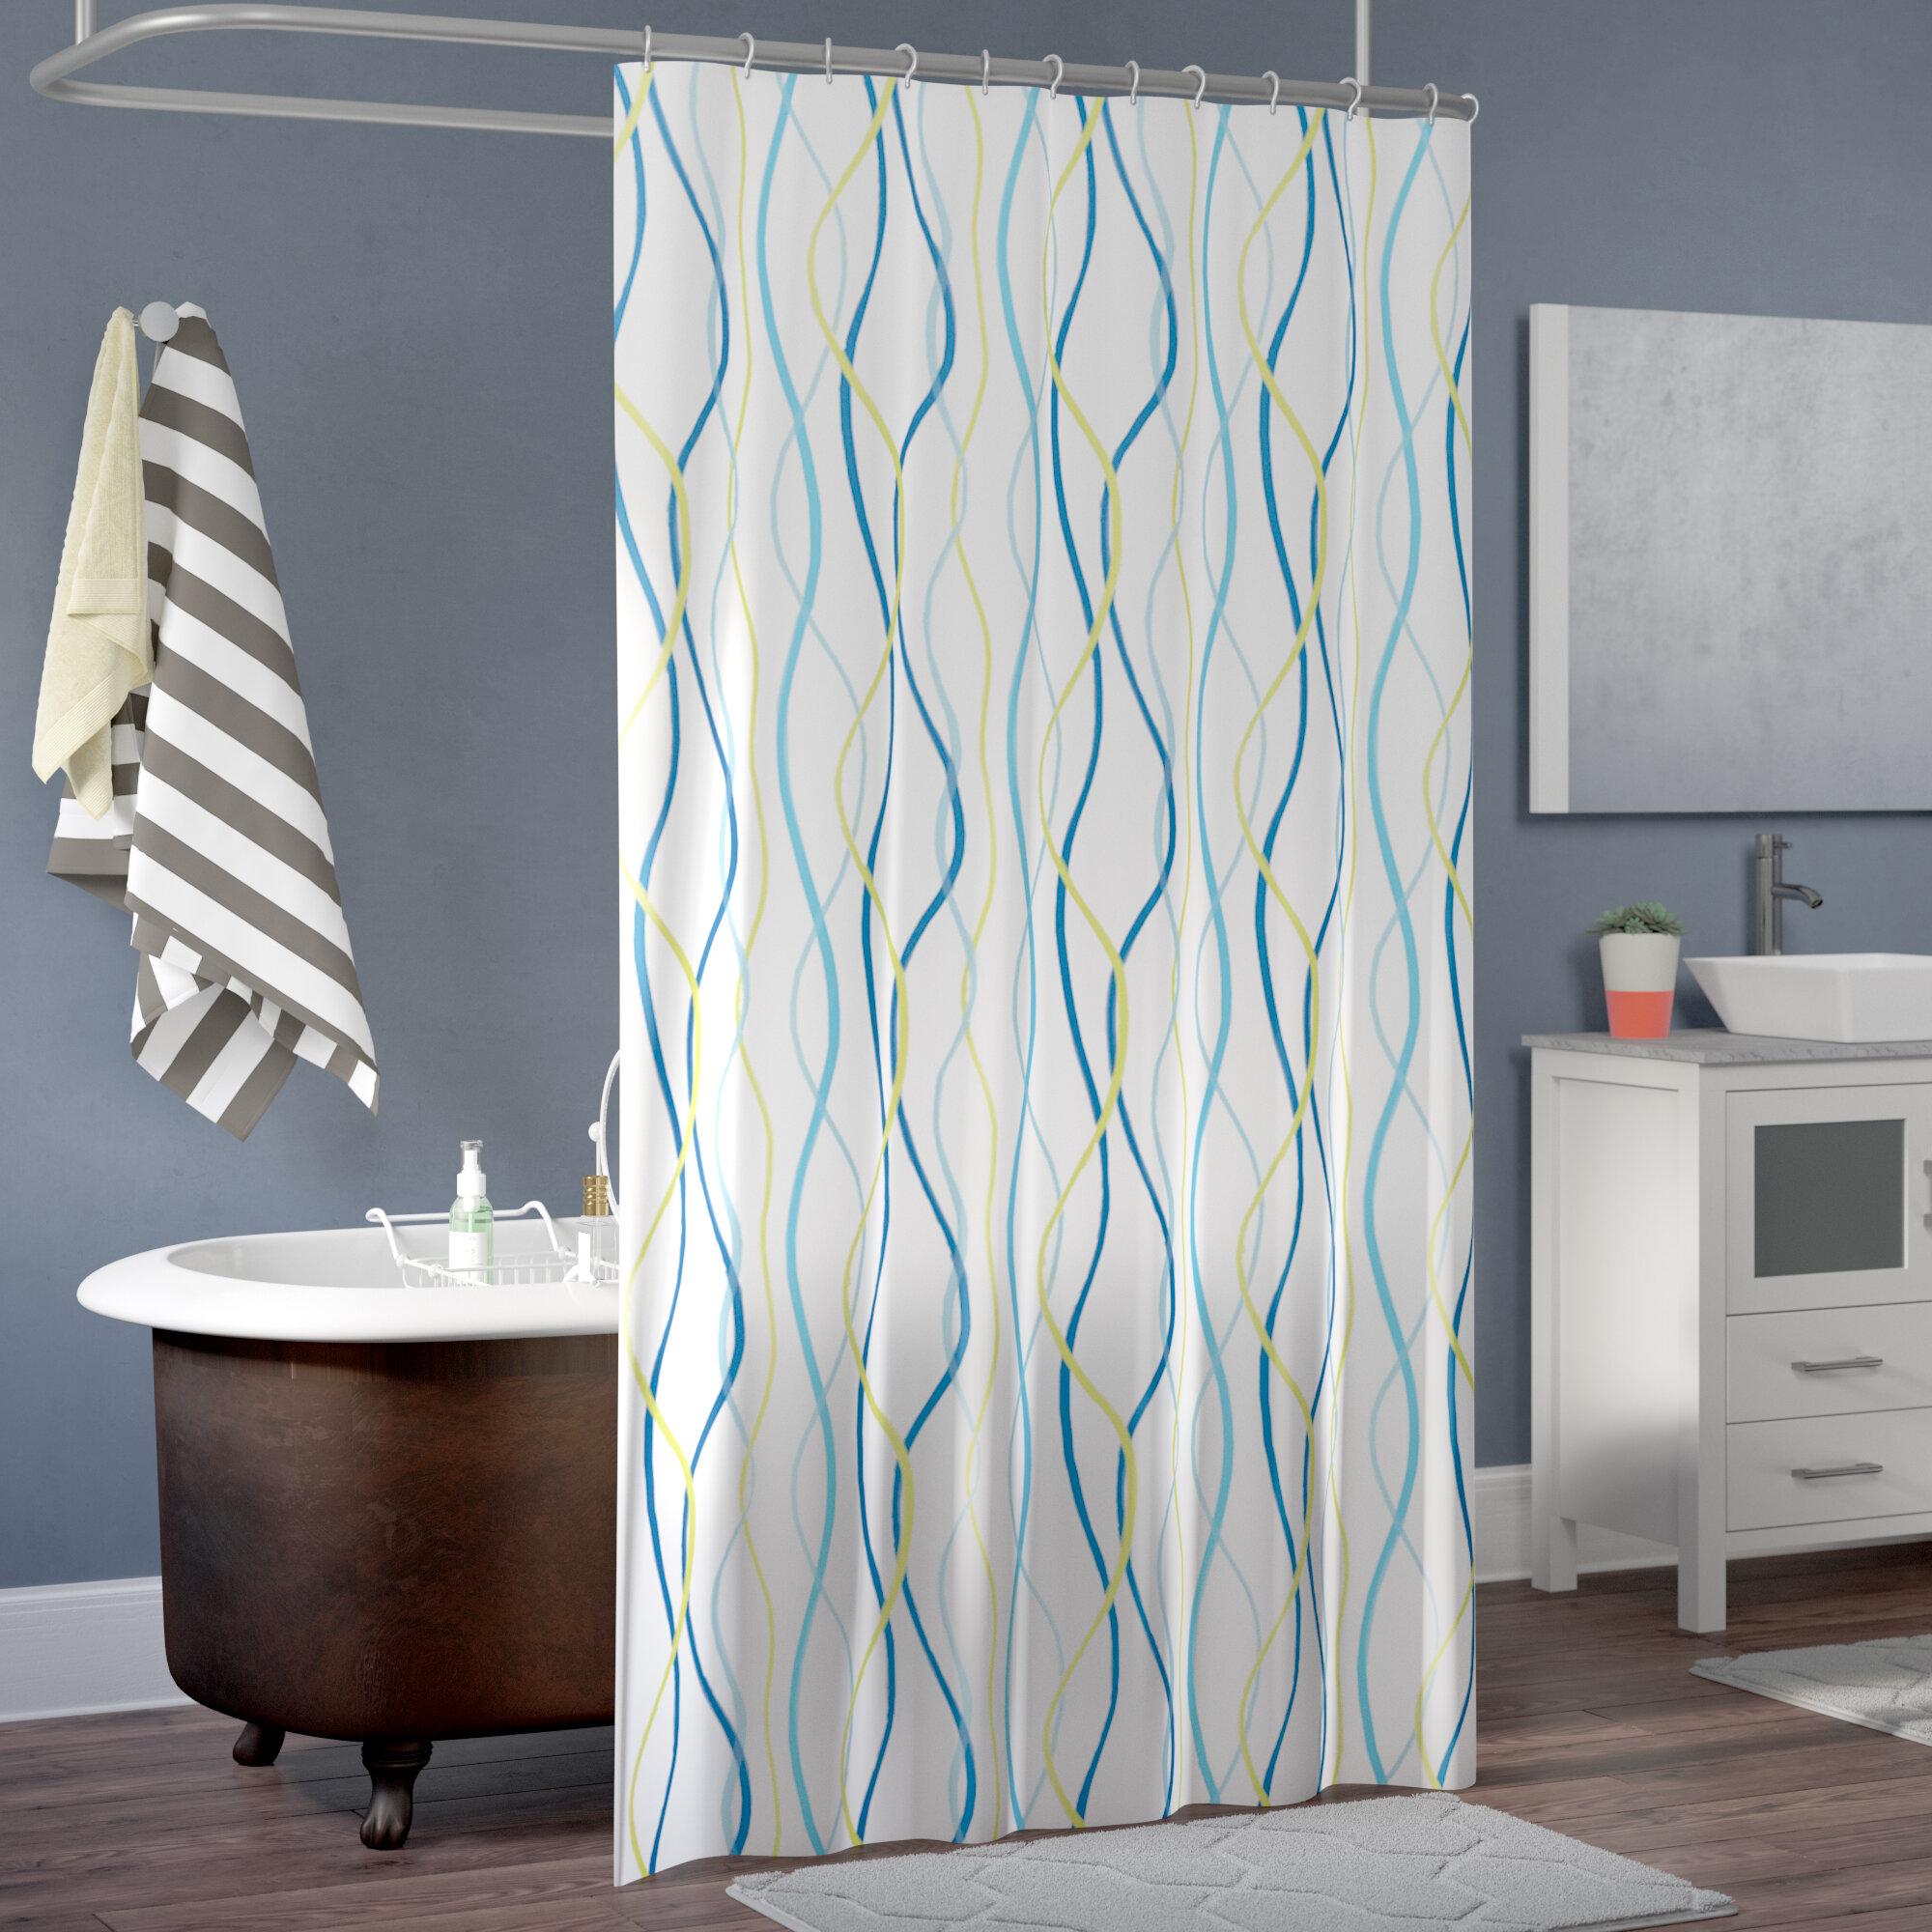 Zipcode Design Wanda Shower Curtain & Reviews | Wayfair